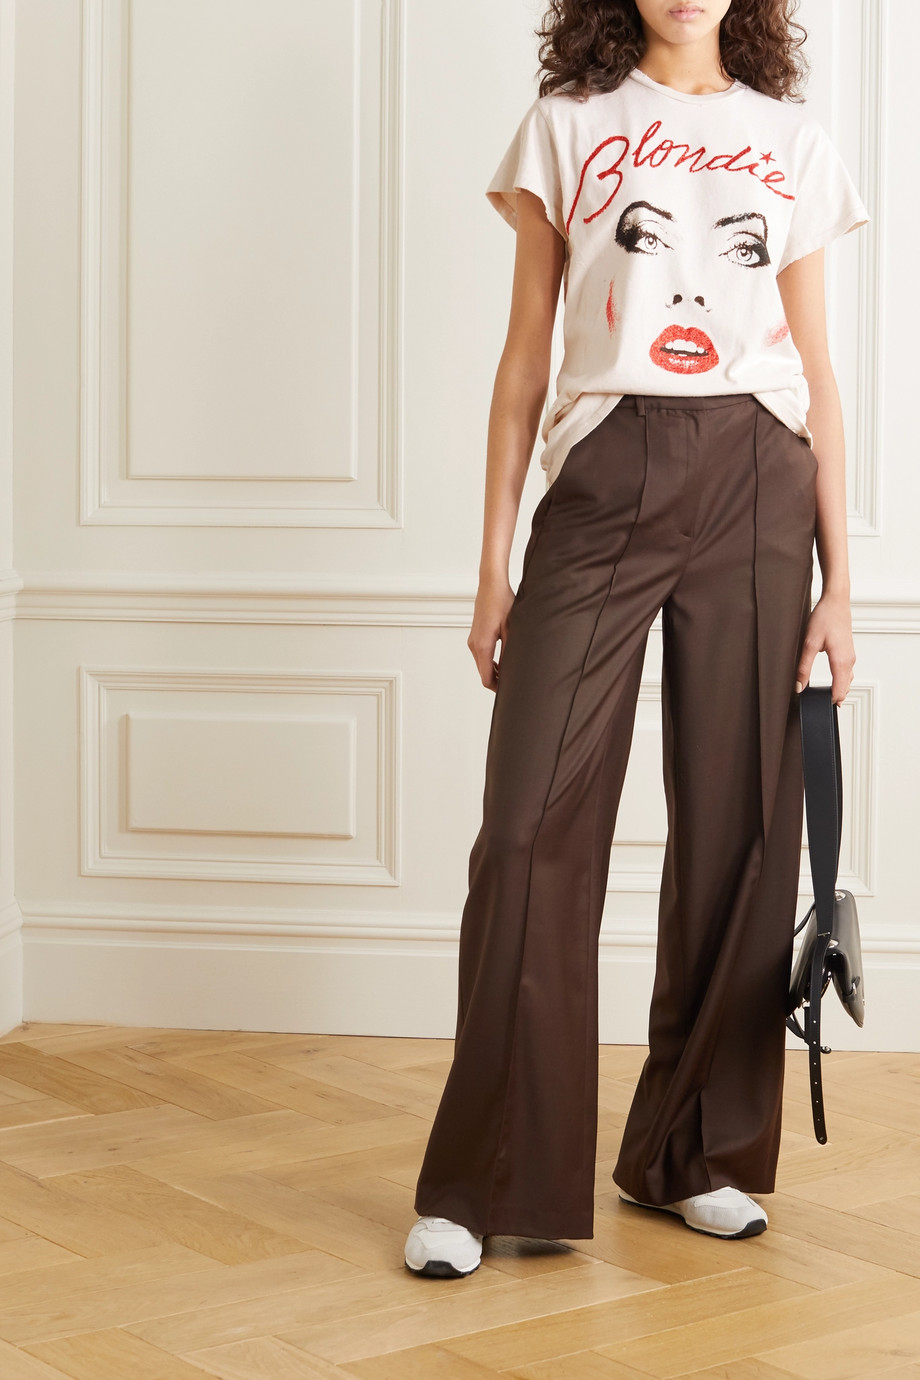 MadeWorn Blondie distressed glittered printed cotton-jersey T-shirt